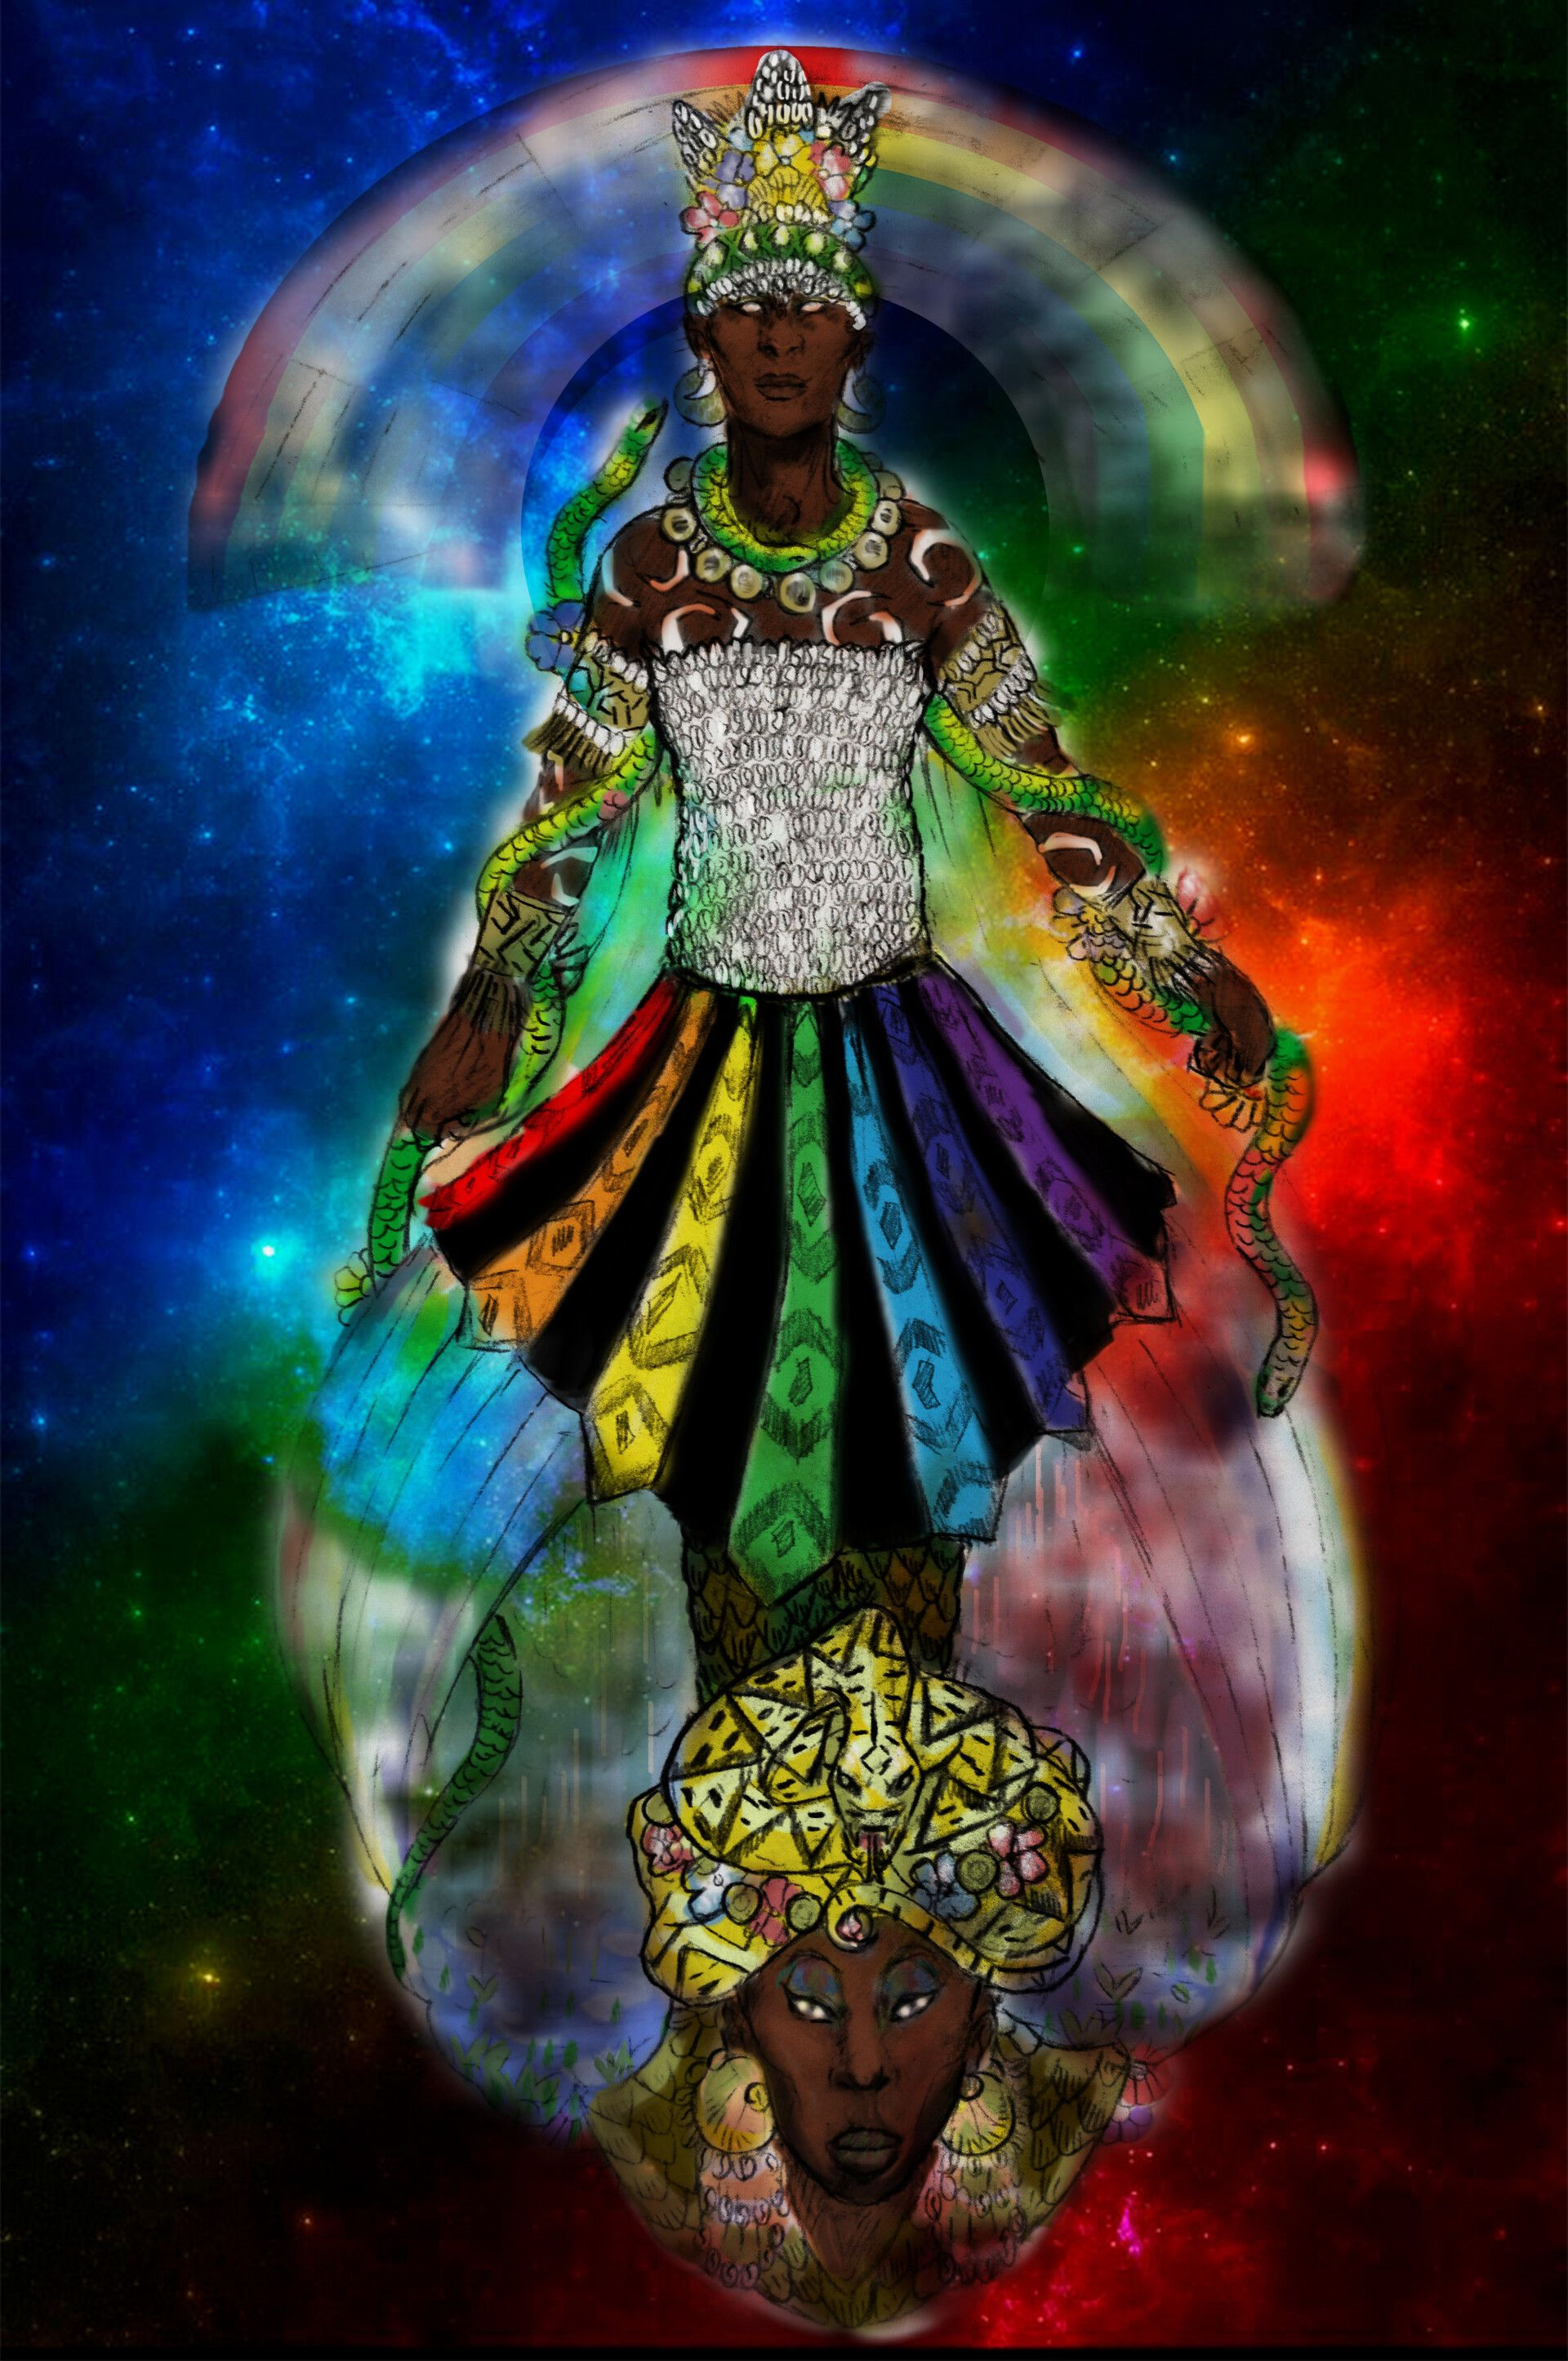 Pin by Márcio Heider on OxuMare in 2020 African